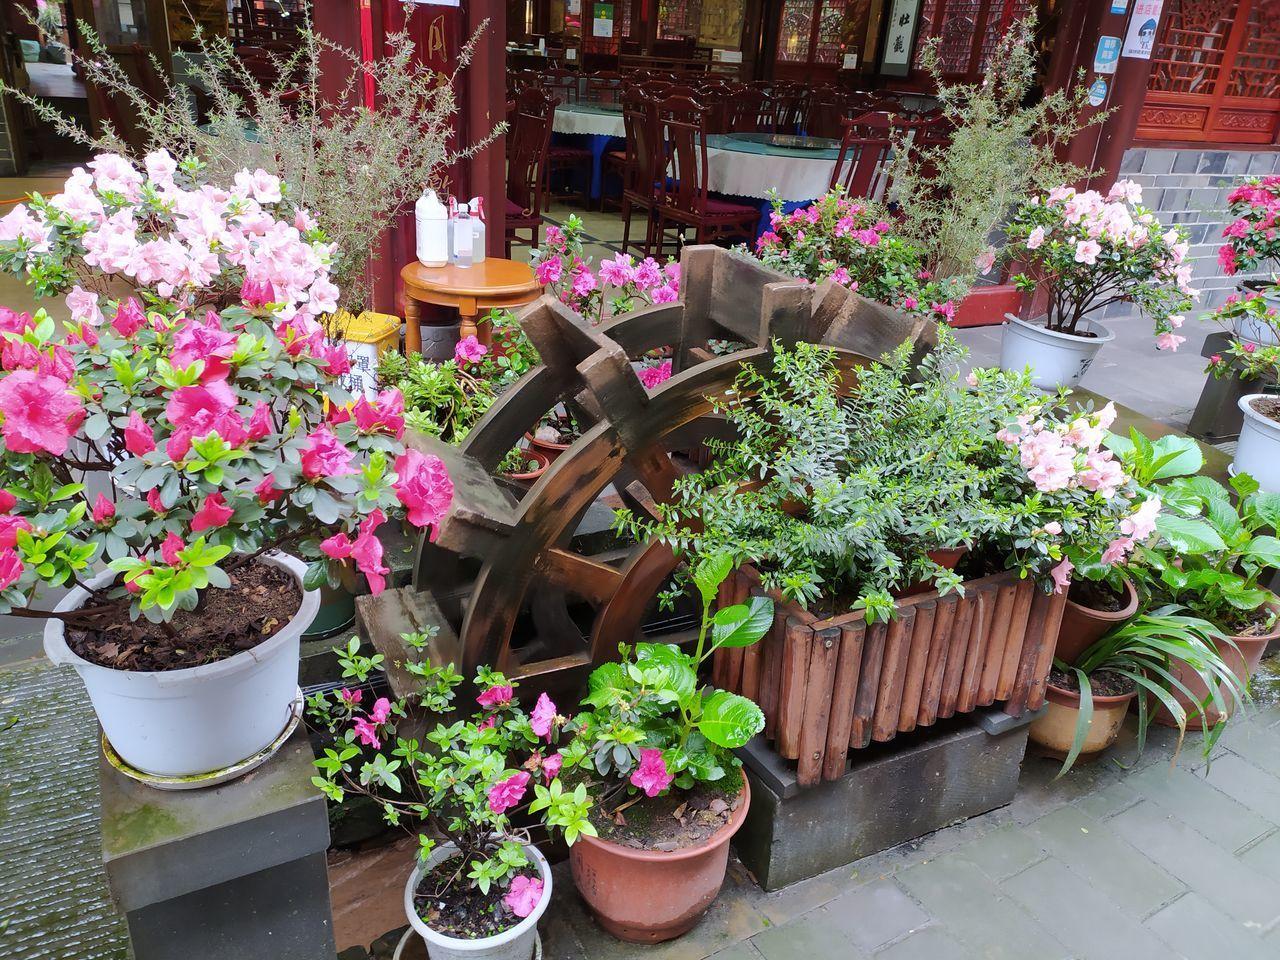 POTTED PLANTS FOR SALE AT FLOWER SHOP